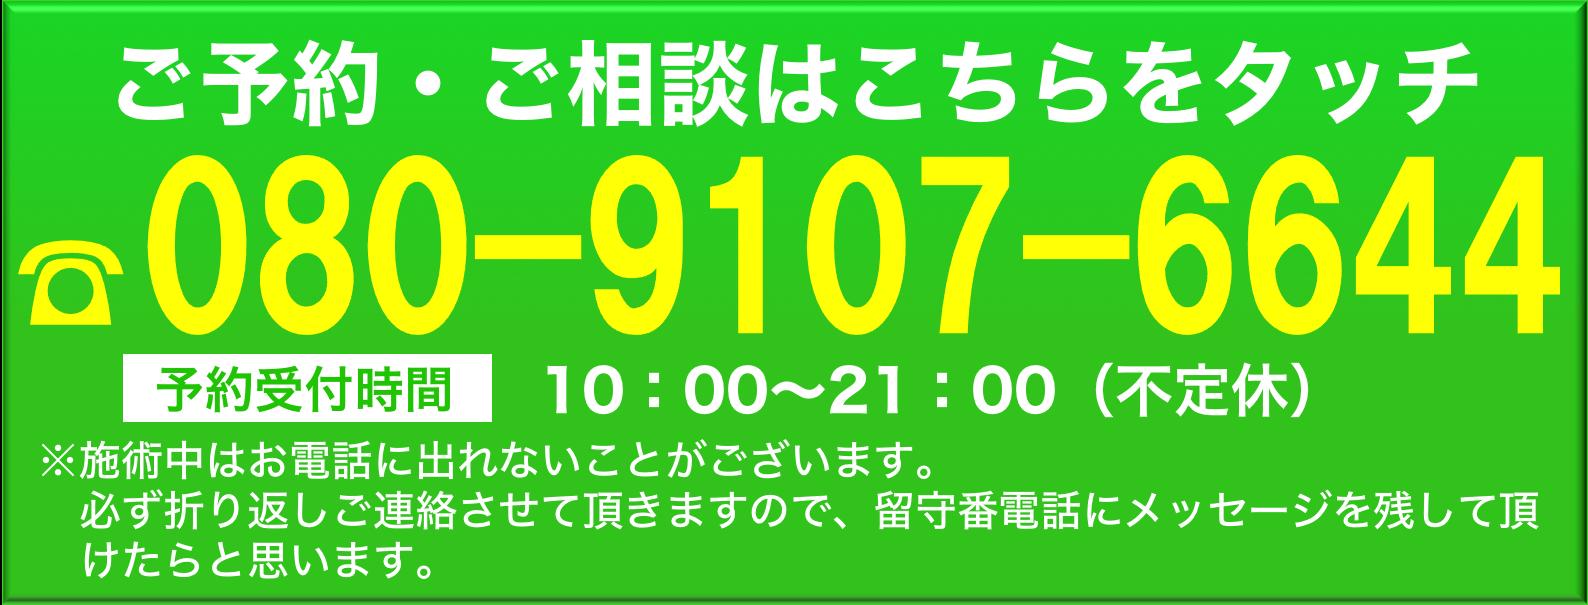 080-9107-6644